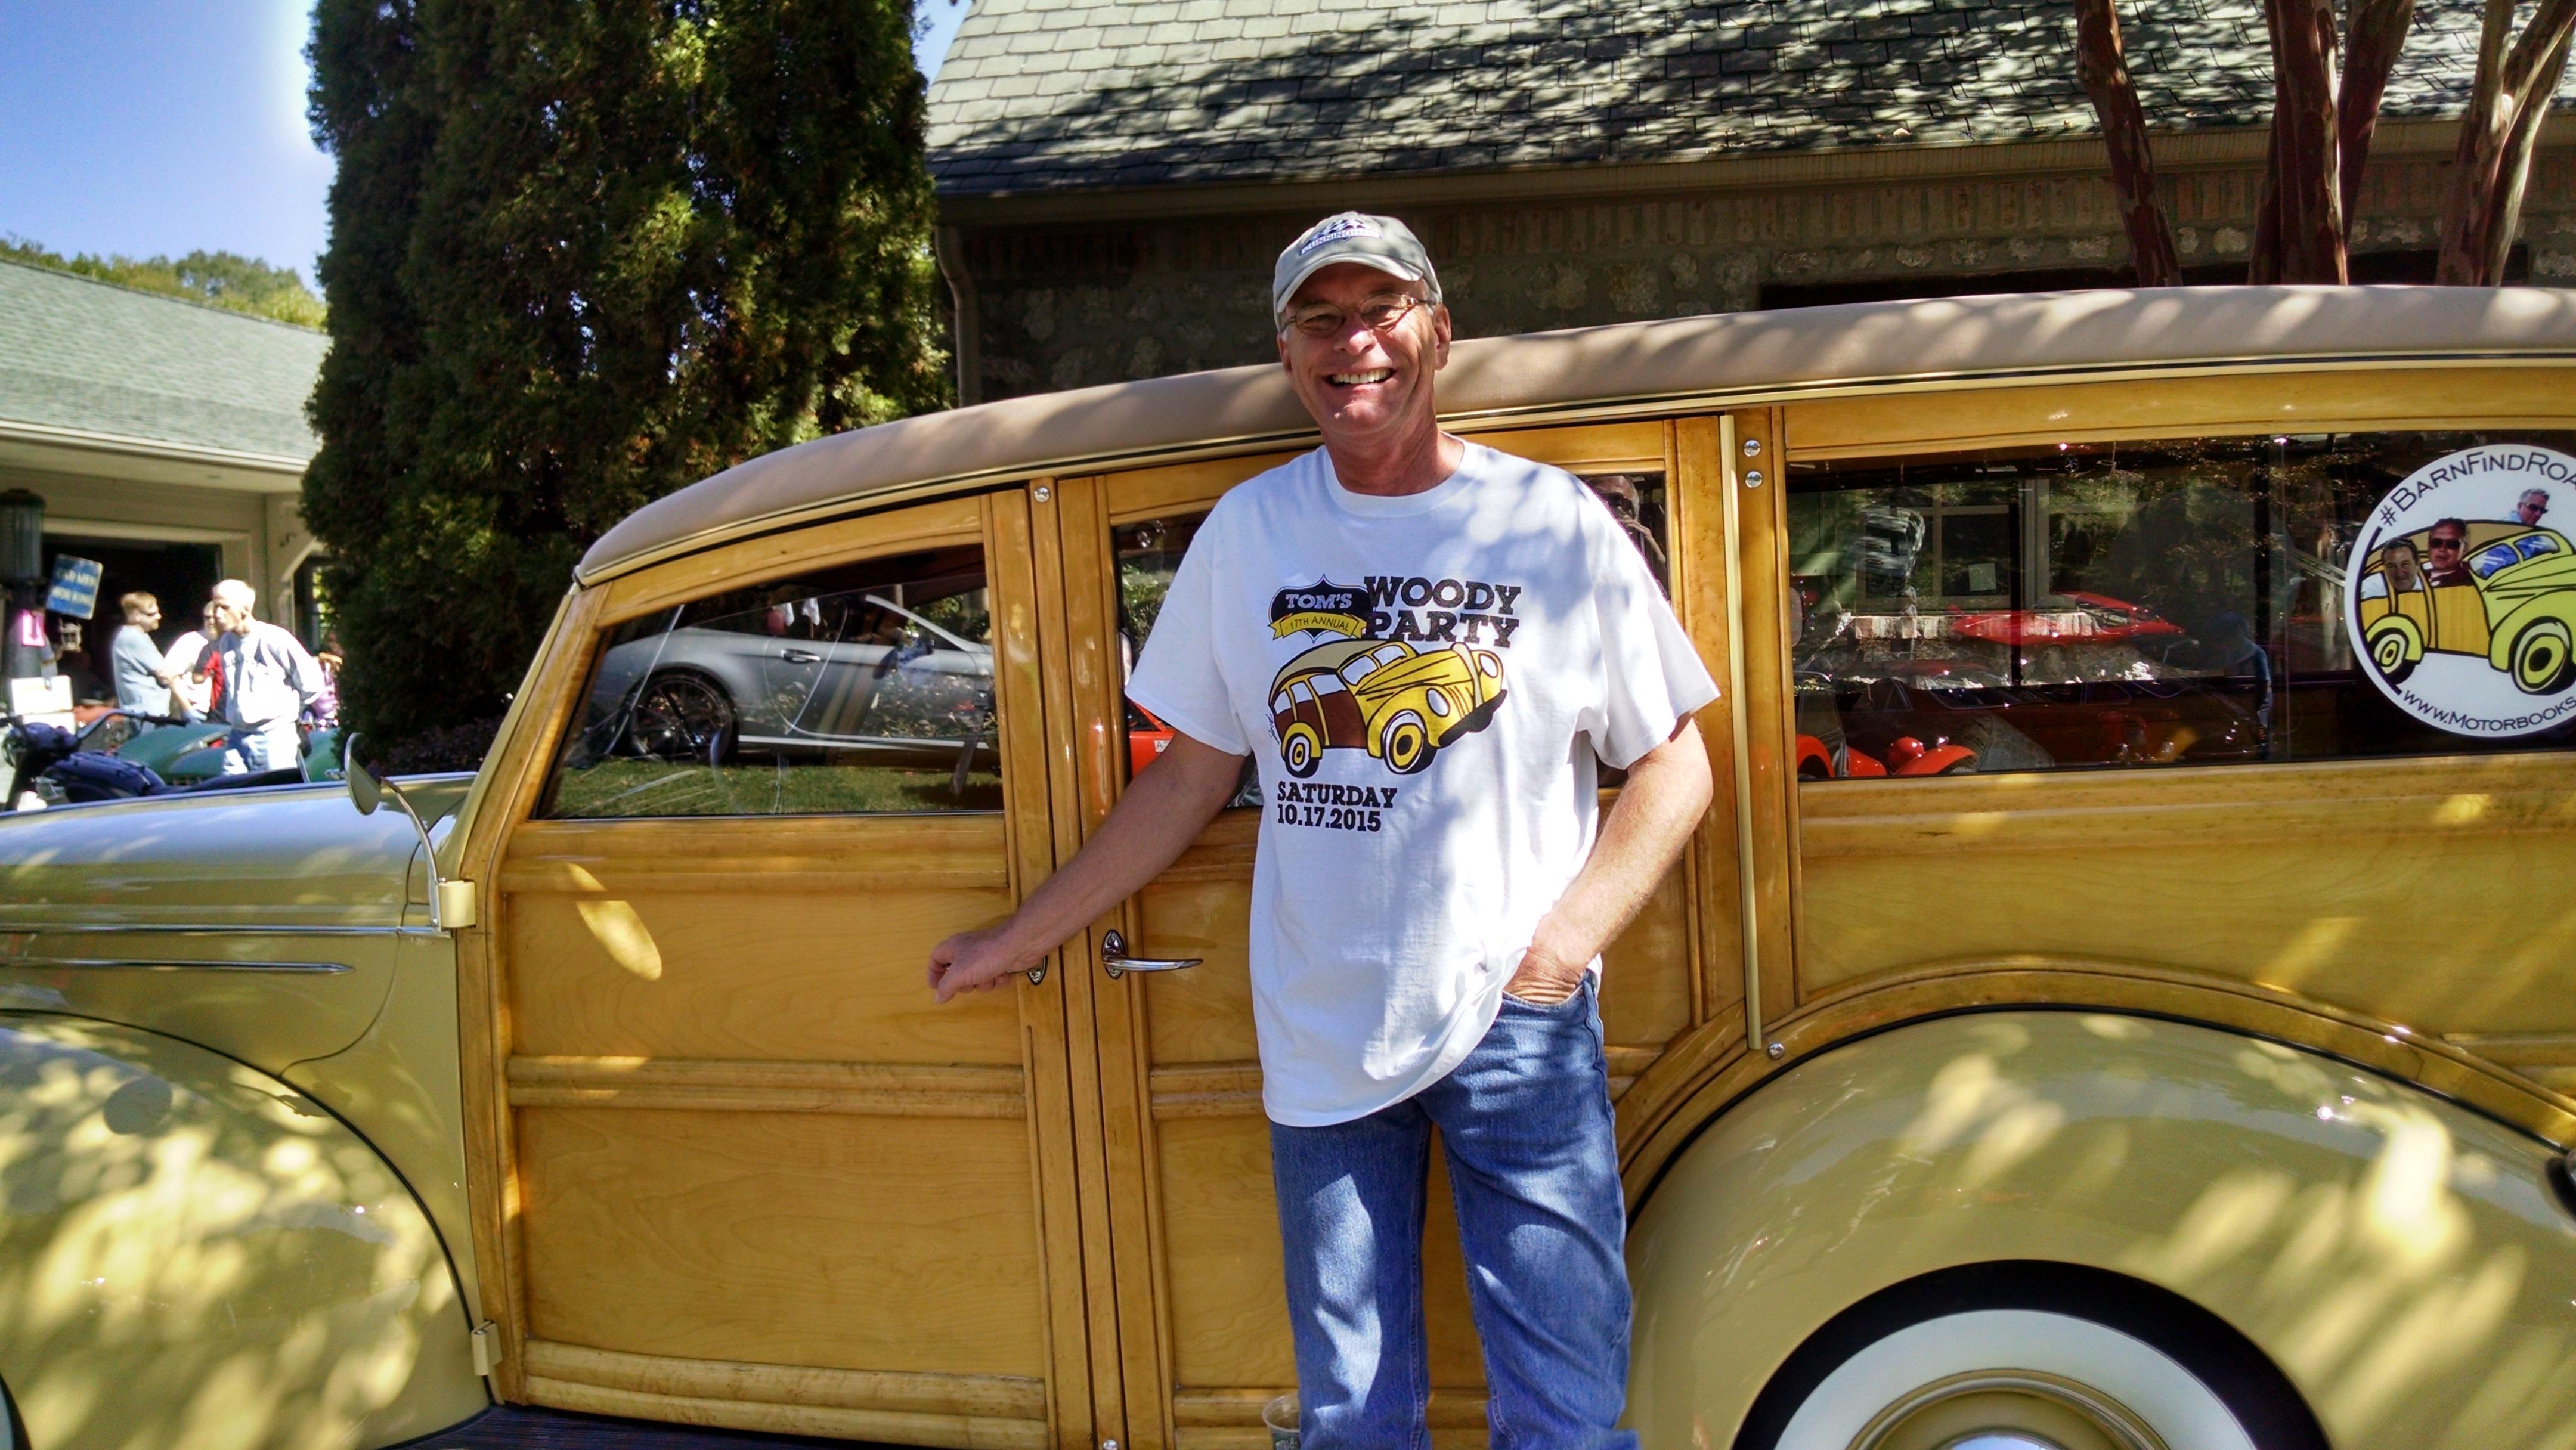 Tom Cotter S 2015 Woody Party Audio Images David Boraks